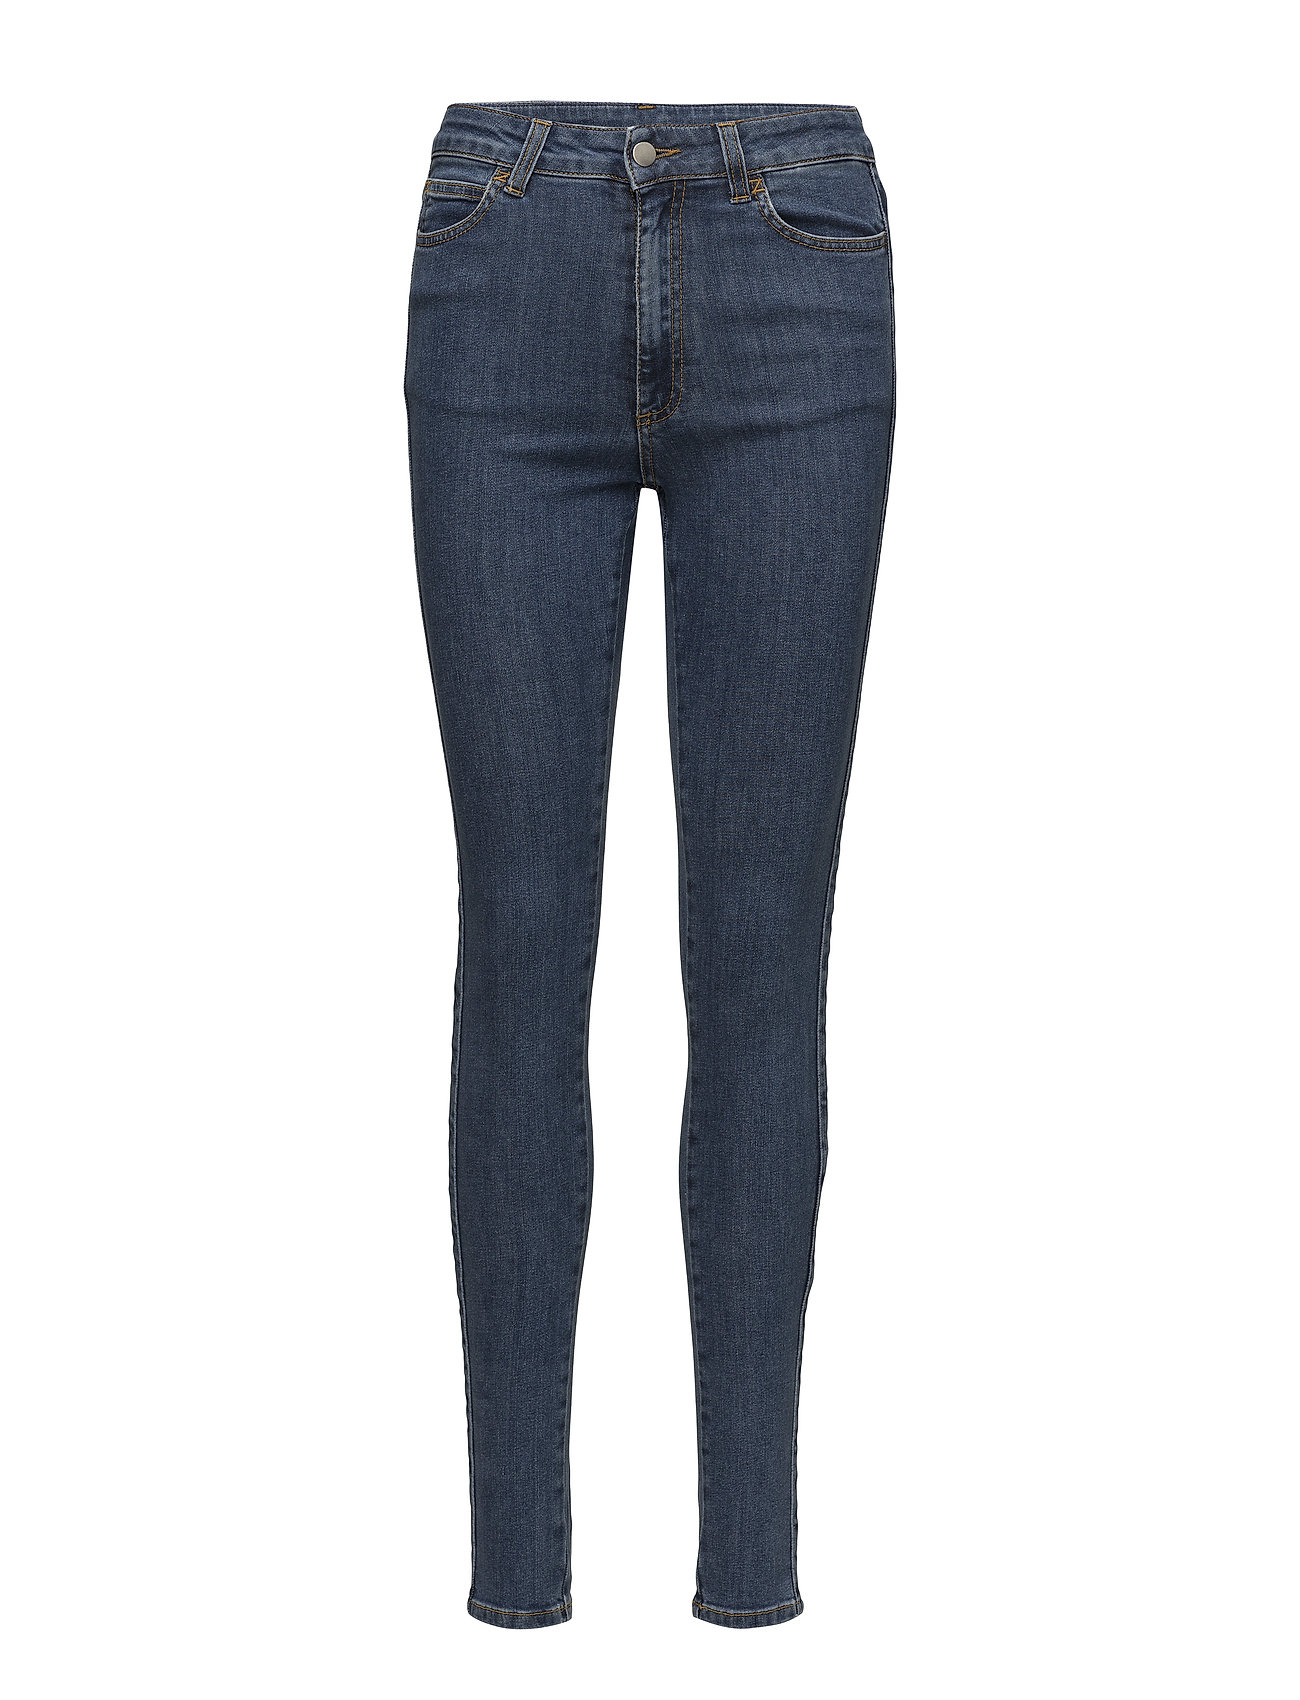 HOLZWEILER ALICE Jeans AW18 - LIGHT BLUE